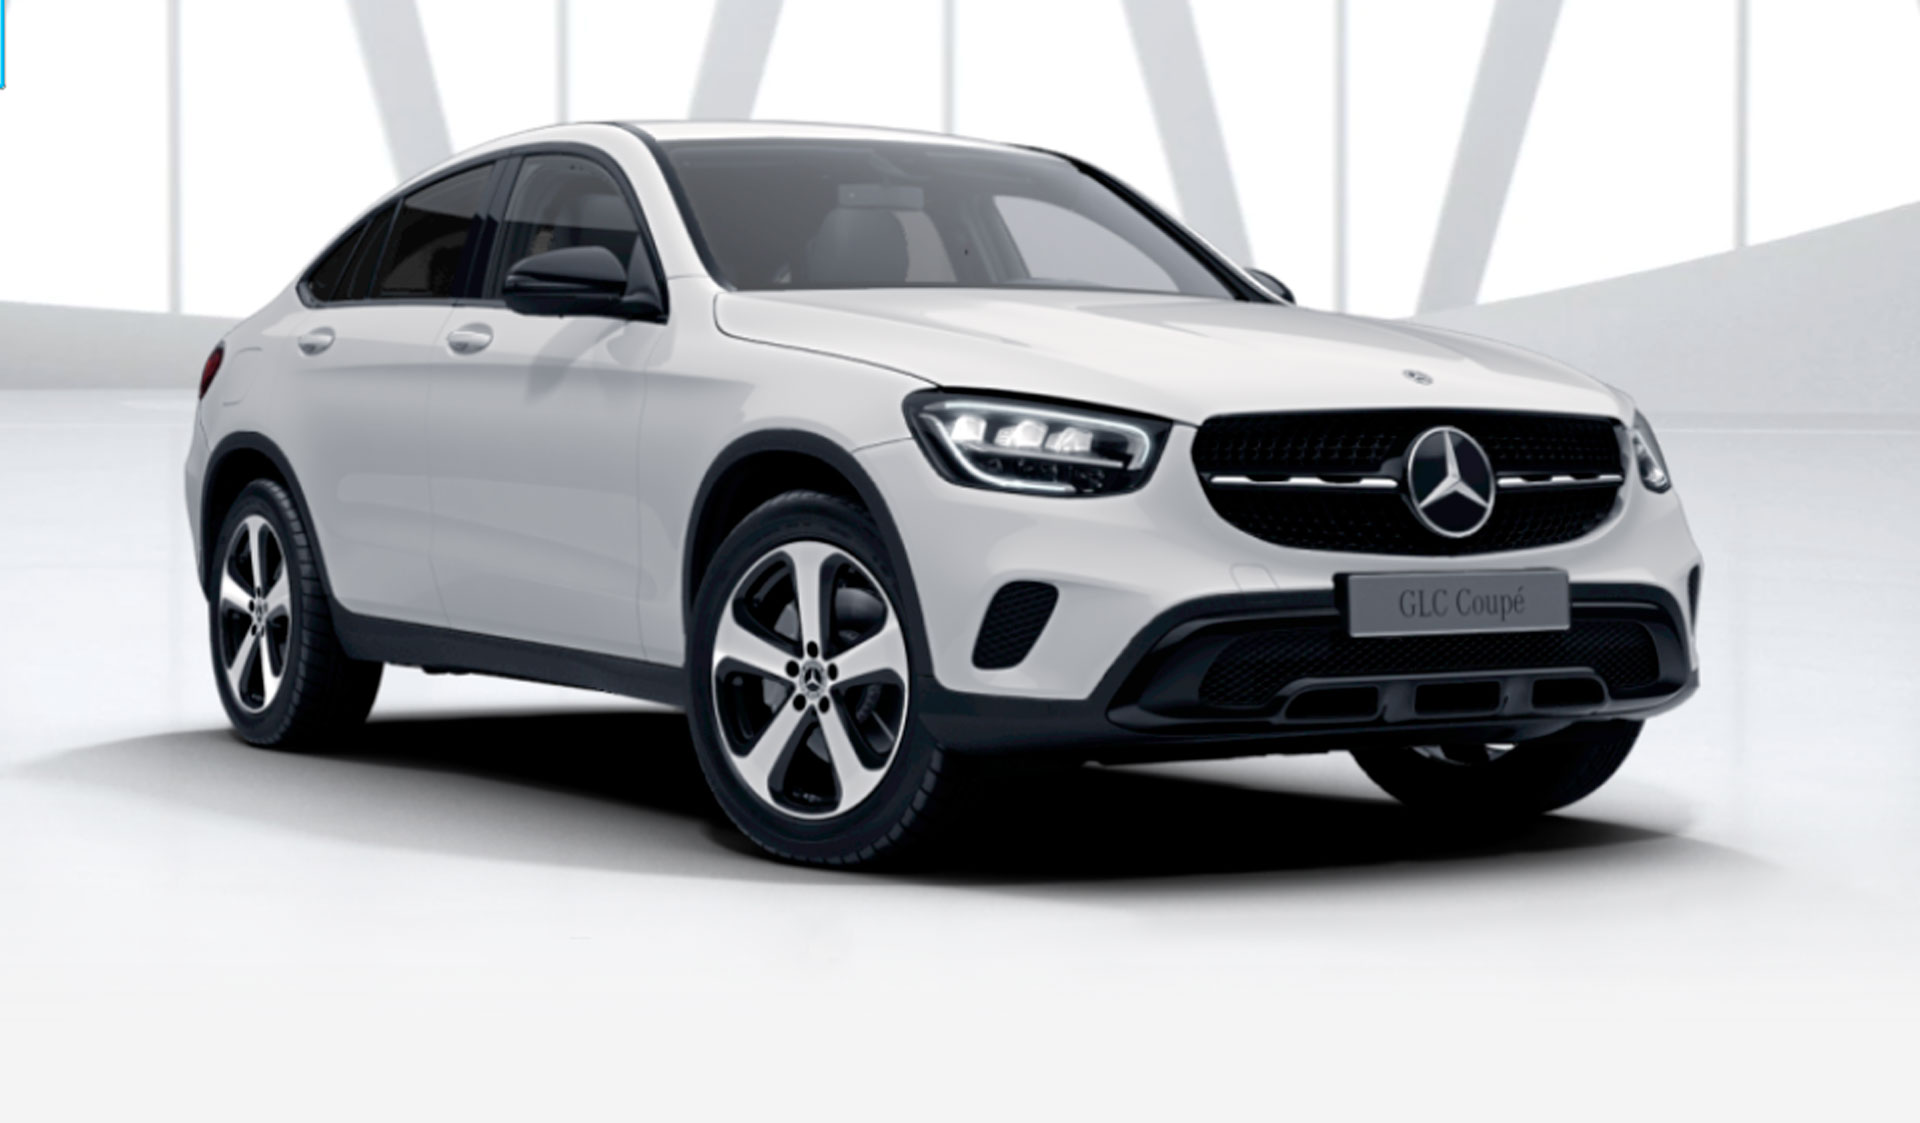 Mercedes-Benz GLC Coupe  0152601524